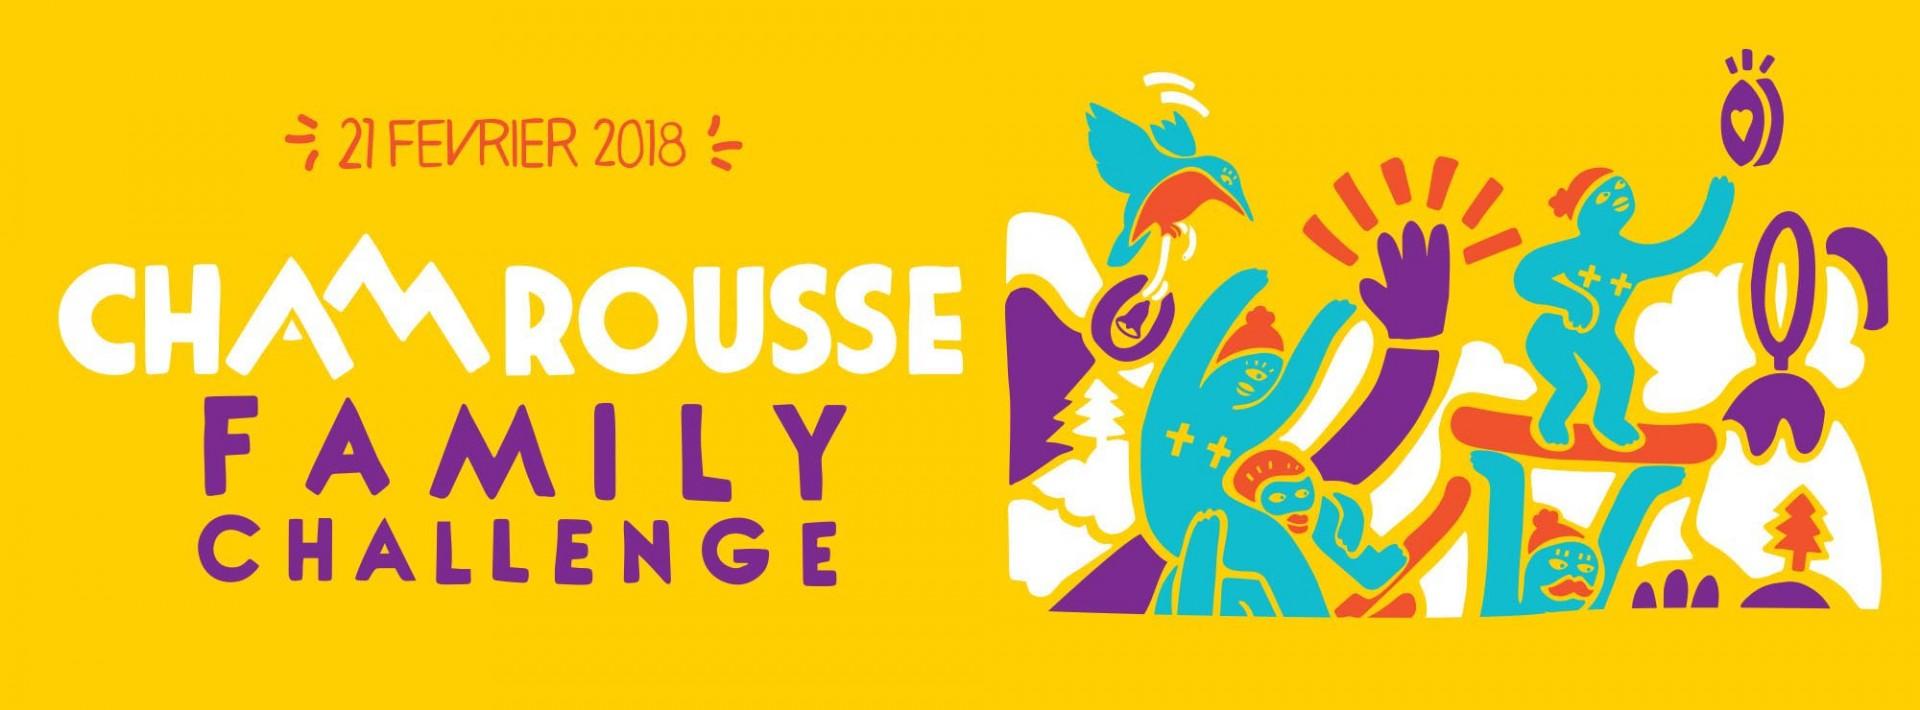 banniere-web-family-challenge-jaune-02-2101